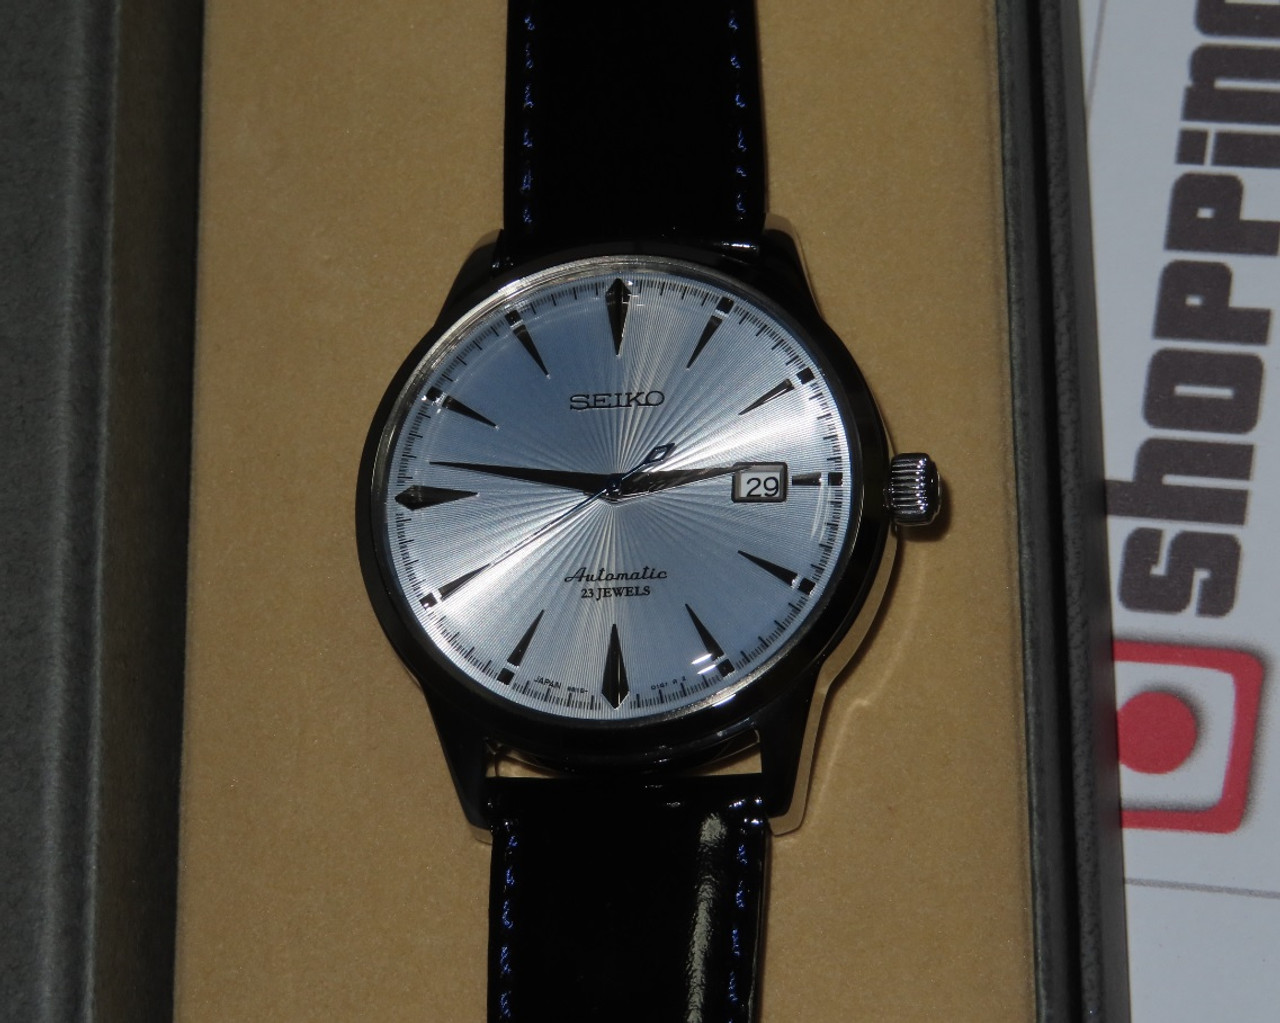 buy online a8e5a 58808 Seiko SARB065 Mechanical Cocktail Time